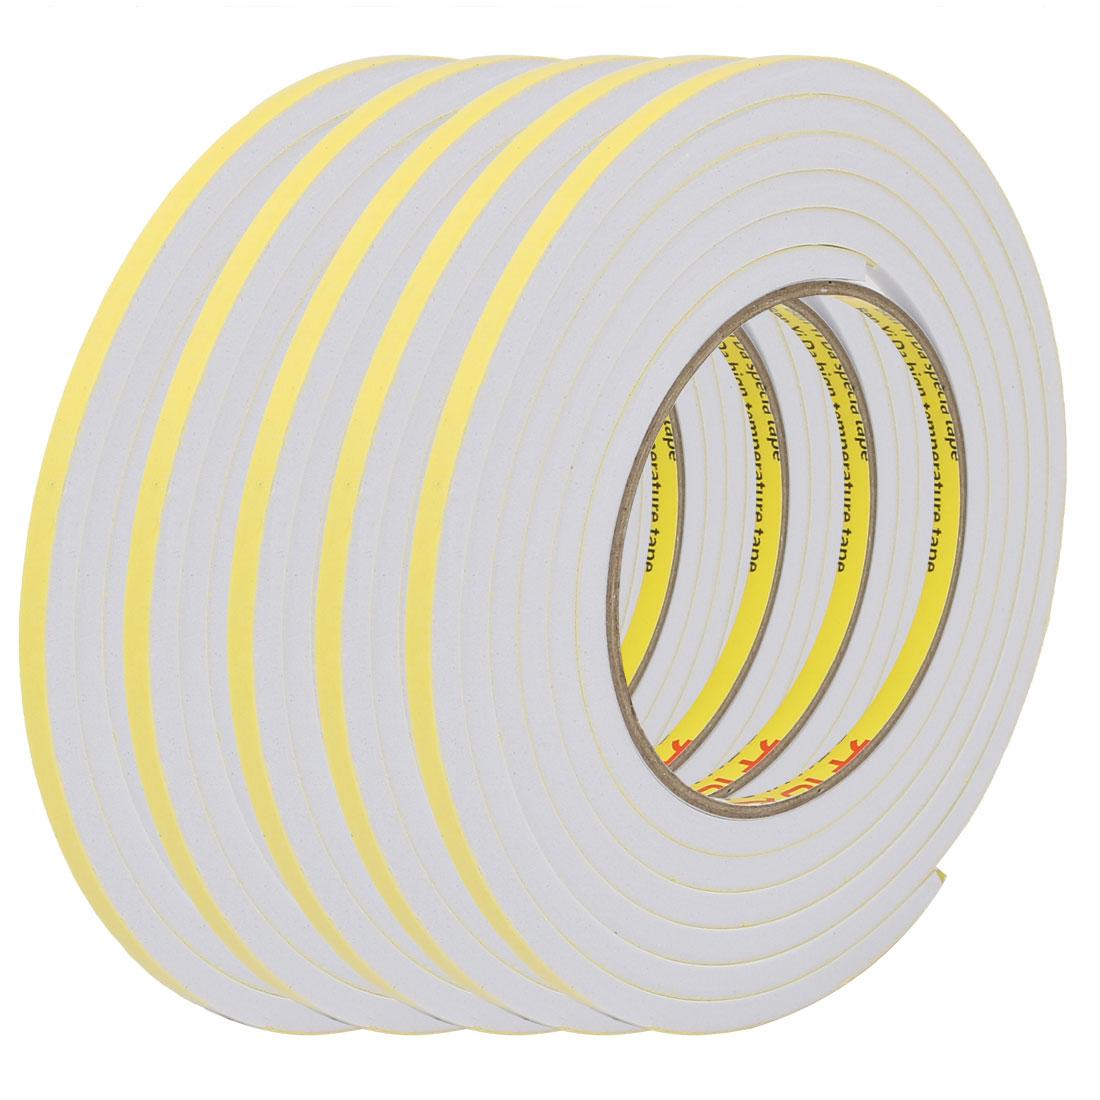 5pcs 5mm Wide 5mm Thick Single Sided Shockproof EVA Sponge Tape White 2M Long